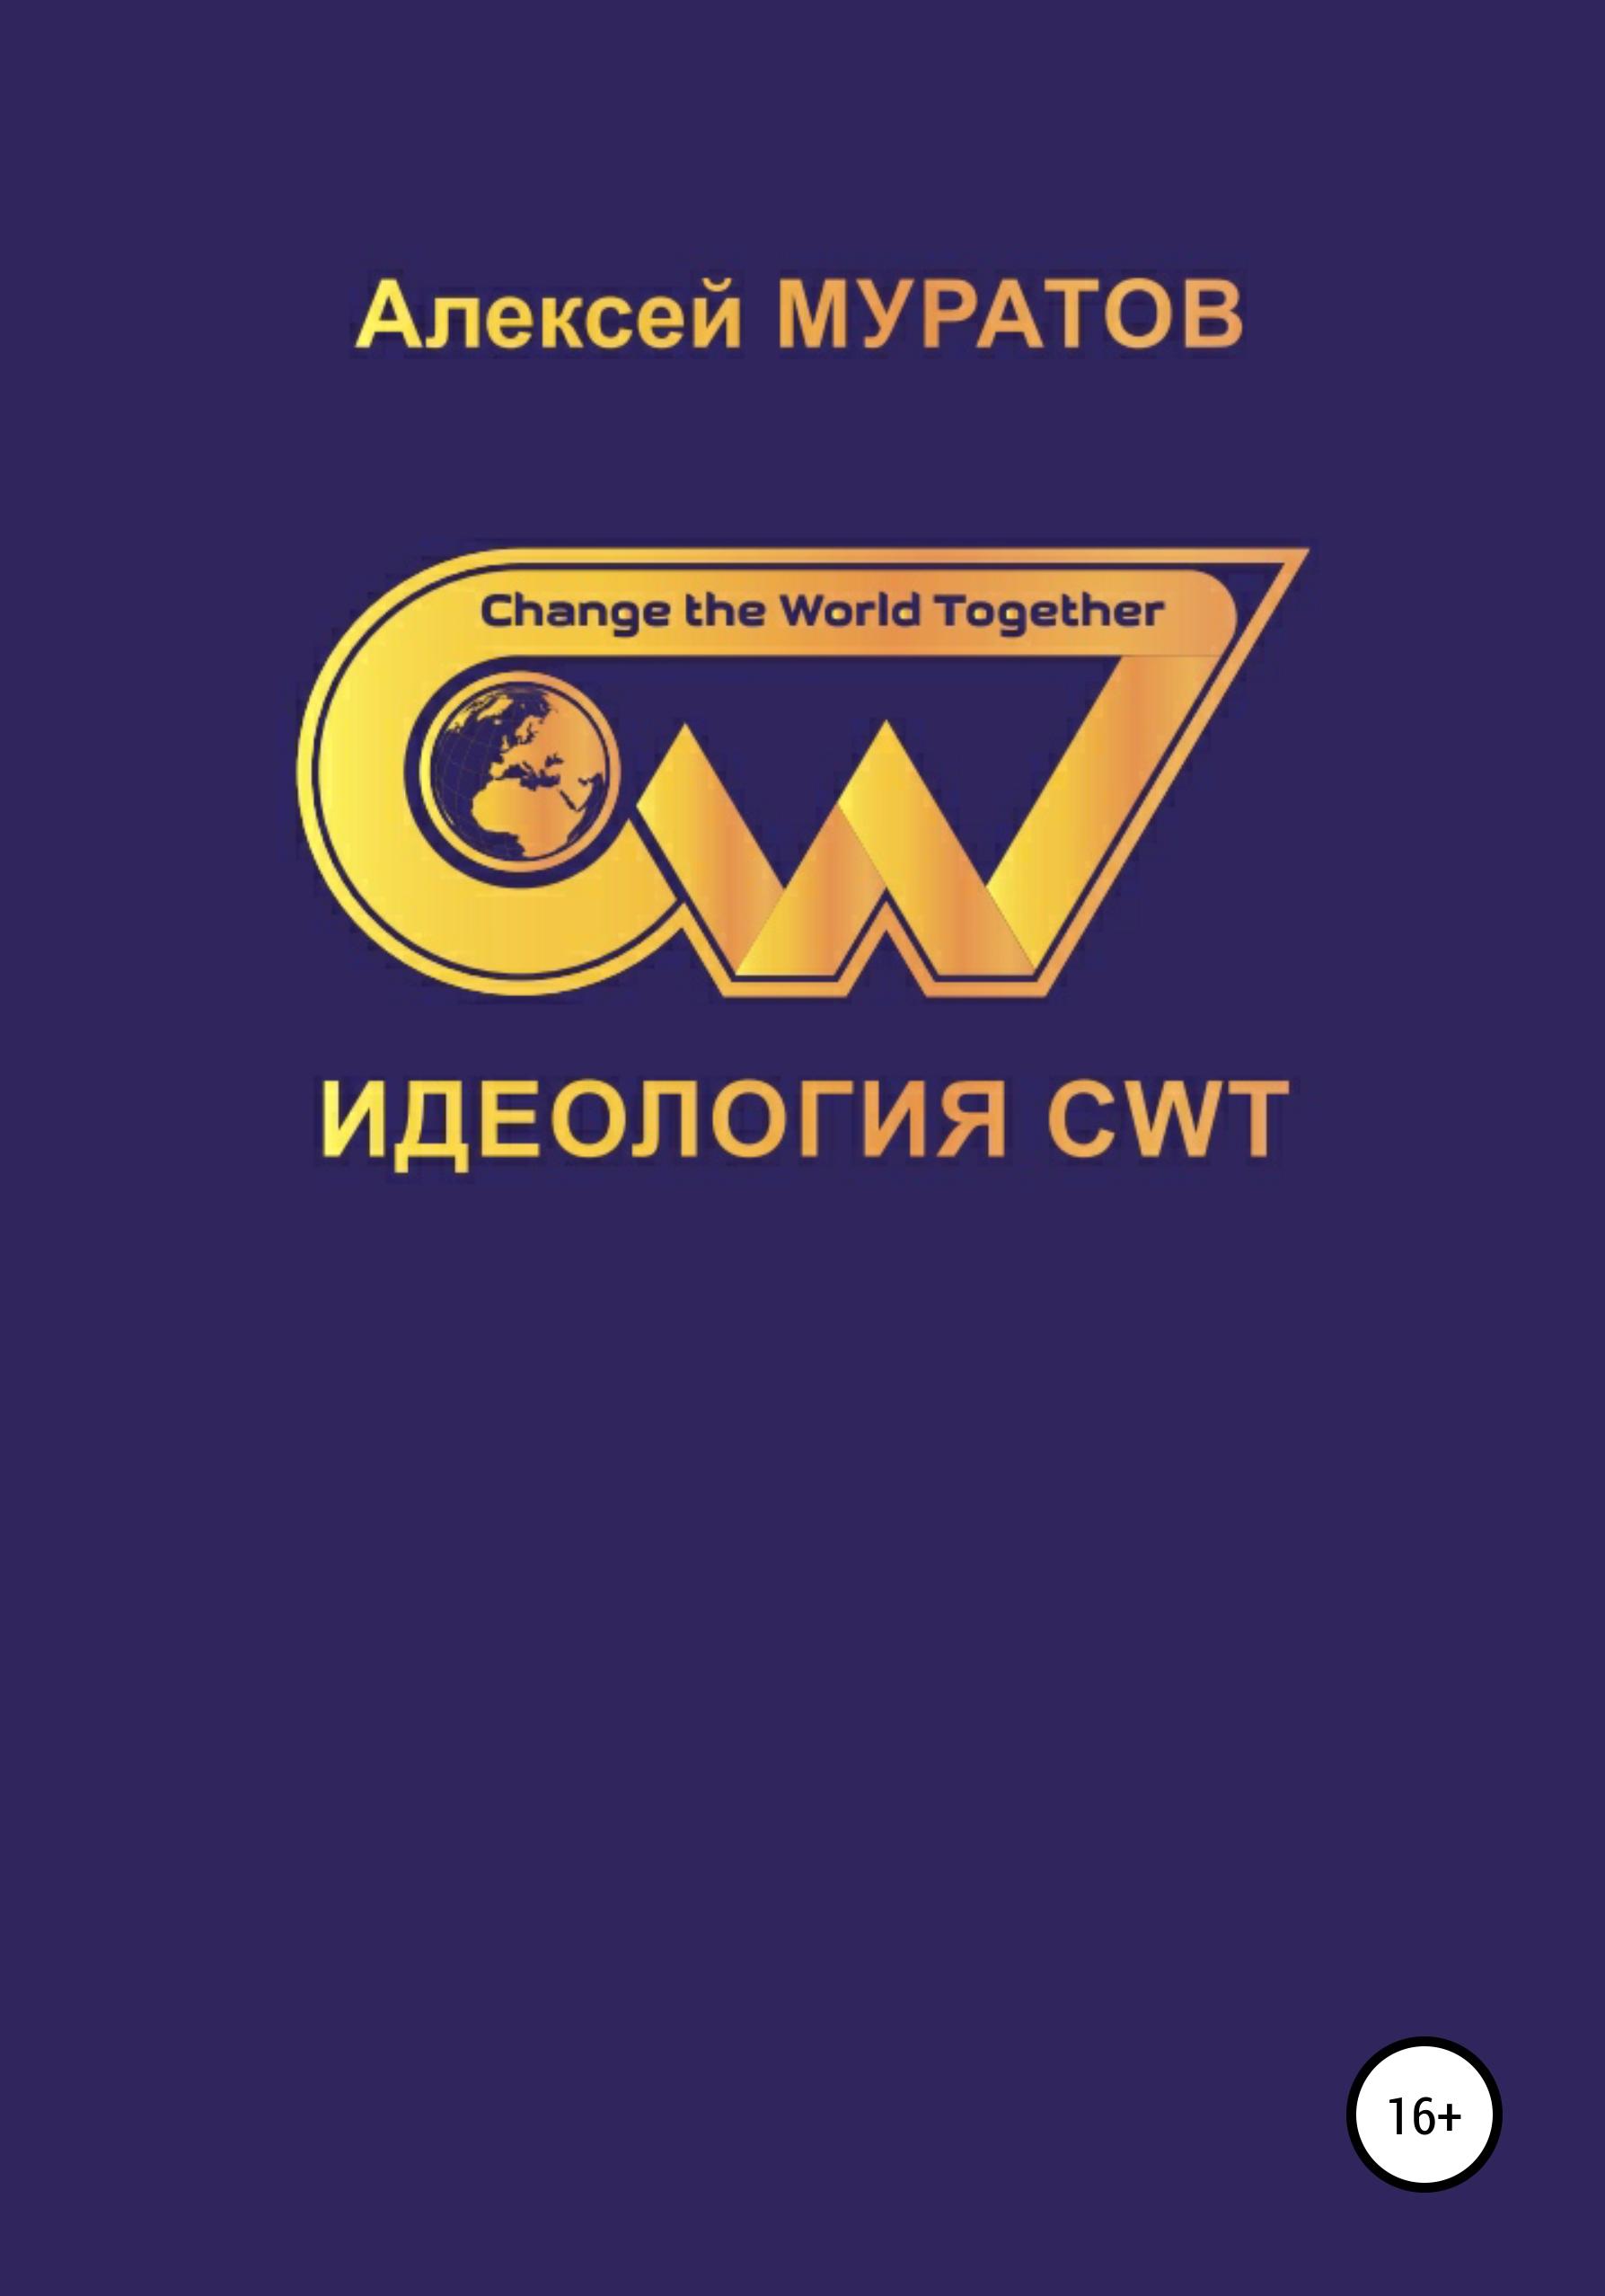 Алексей Муратов Идеология CWT. Change the World Together